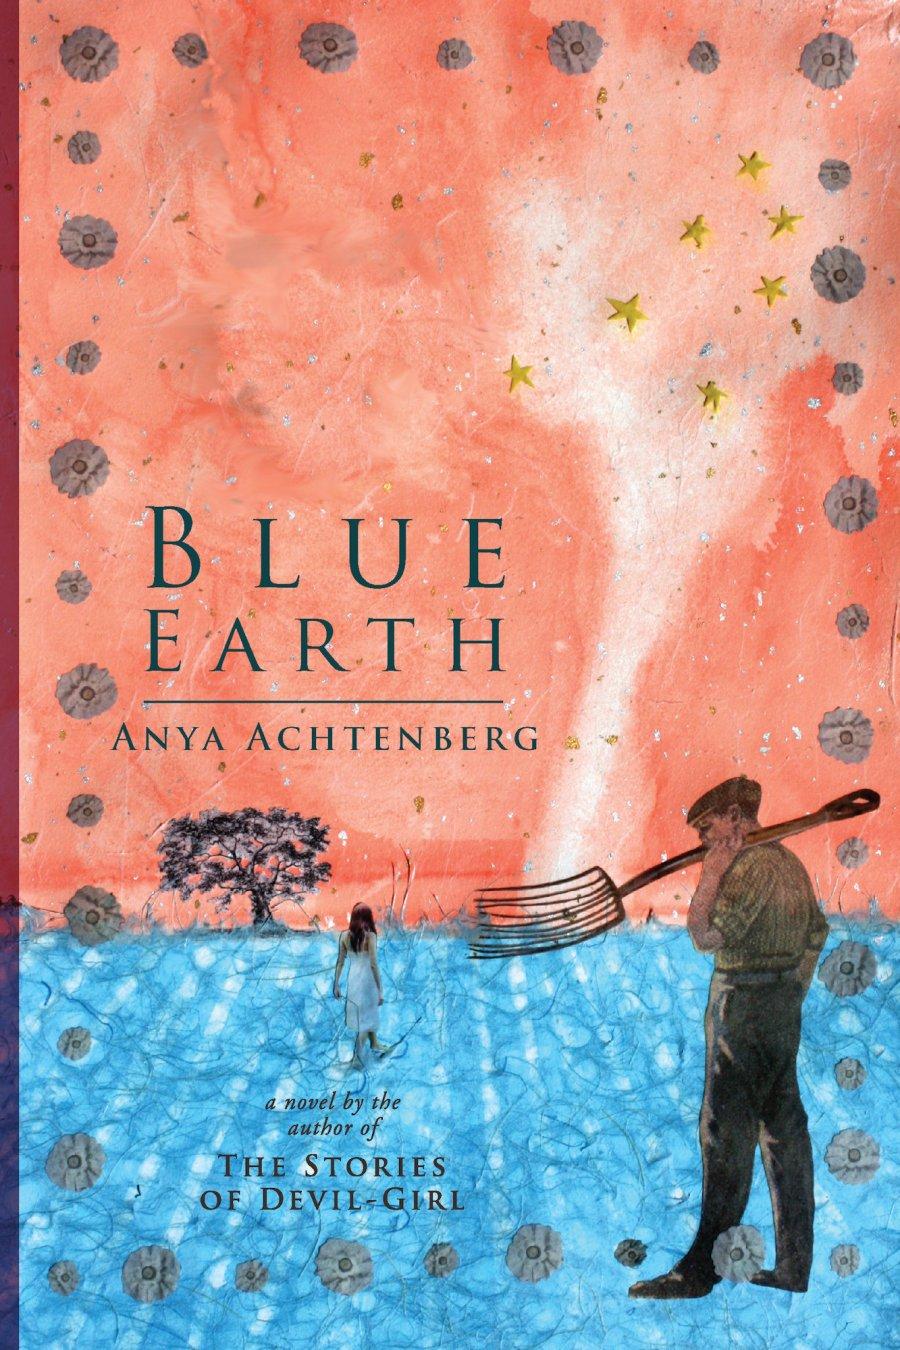 Blue Earth 978-1-61599-146-4